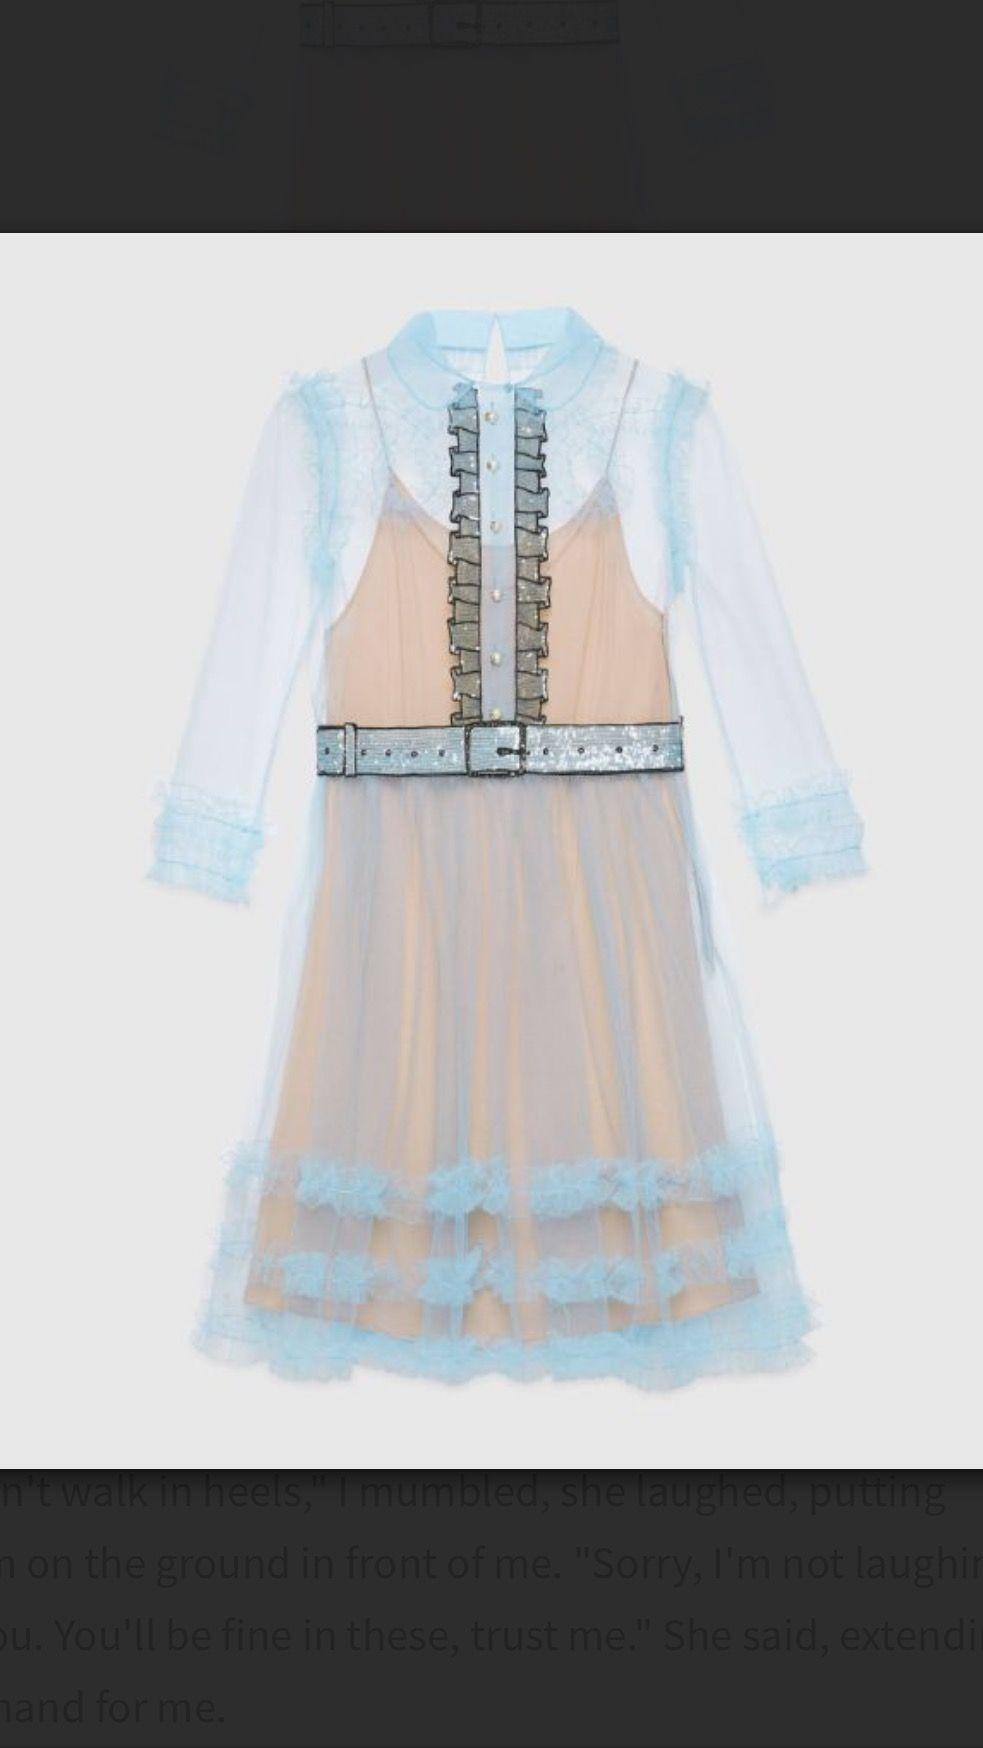 debdf77f0 Your Ascot and spring wedding wardrobe